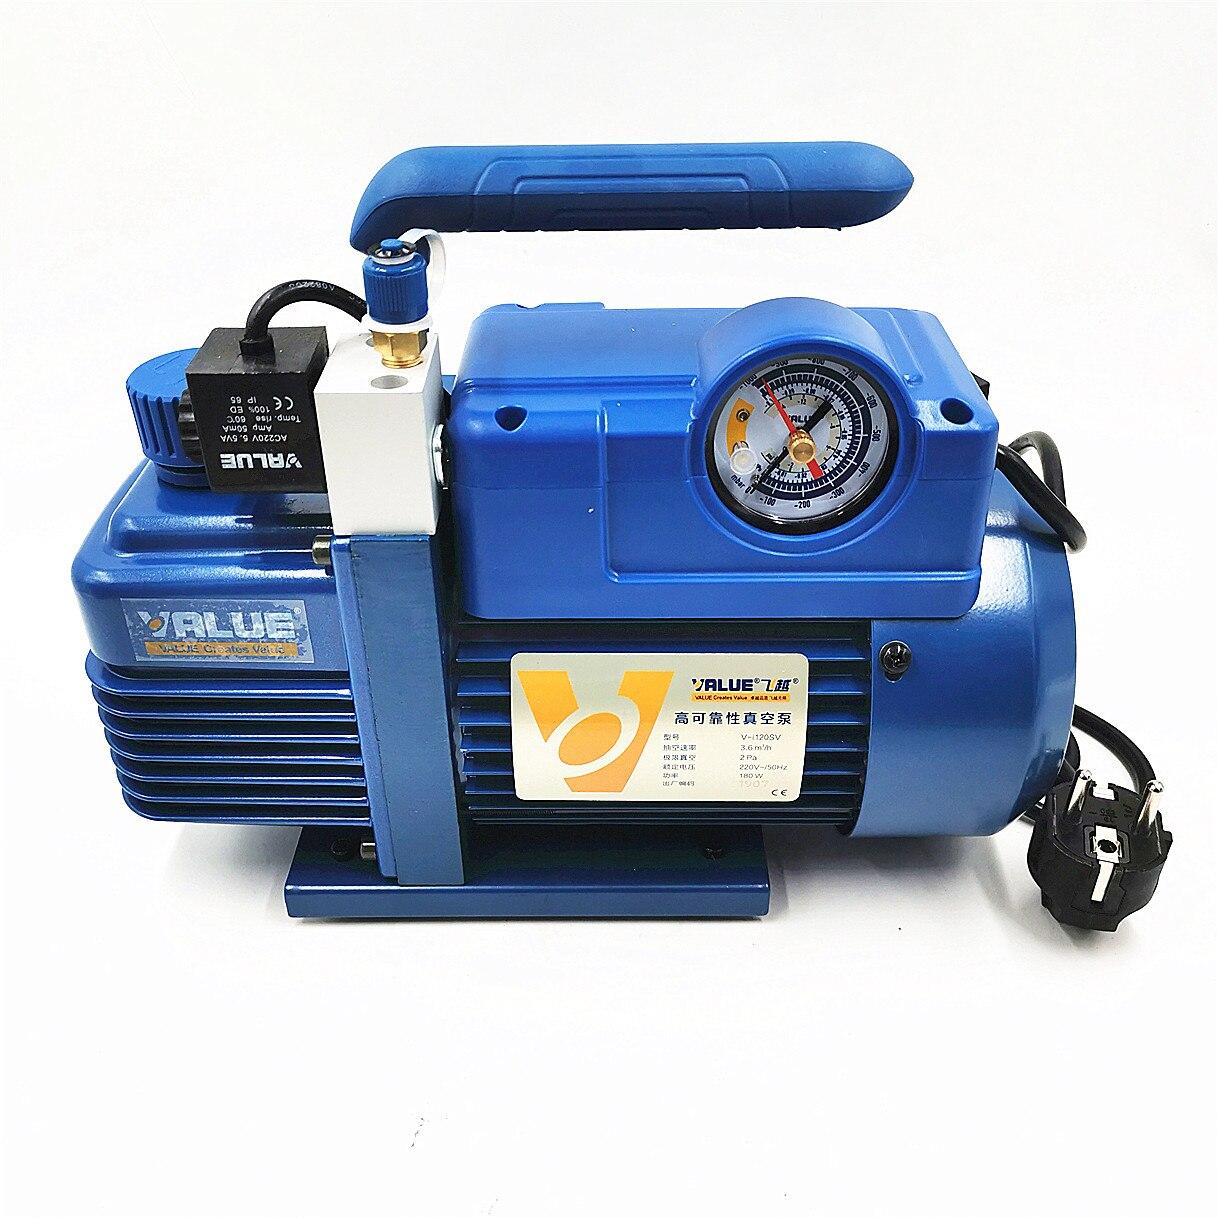 3.6m3/h 220V 180W V-i120SV air conditioning laboratory air pump refrigerate R410 vacuum pump 1L R410 R407C R134a R12 R22